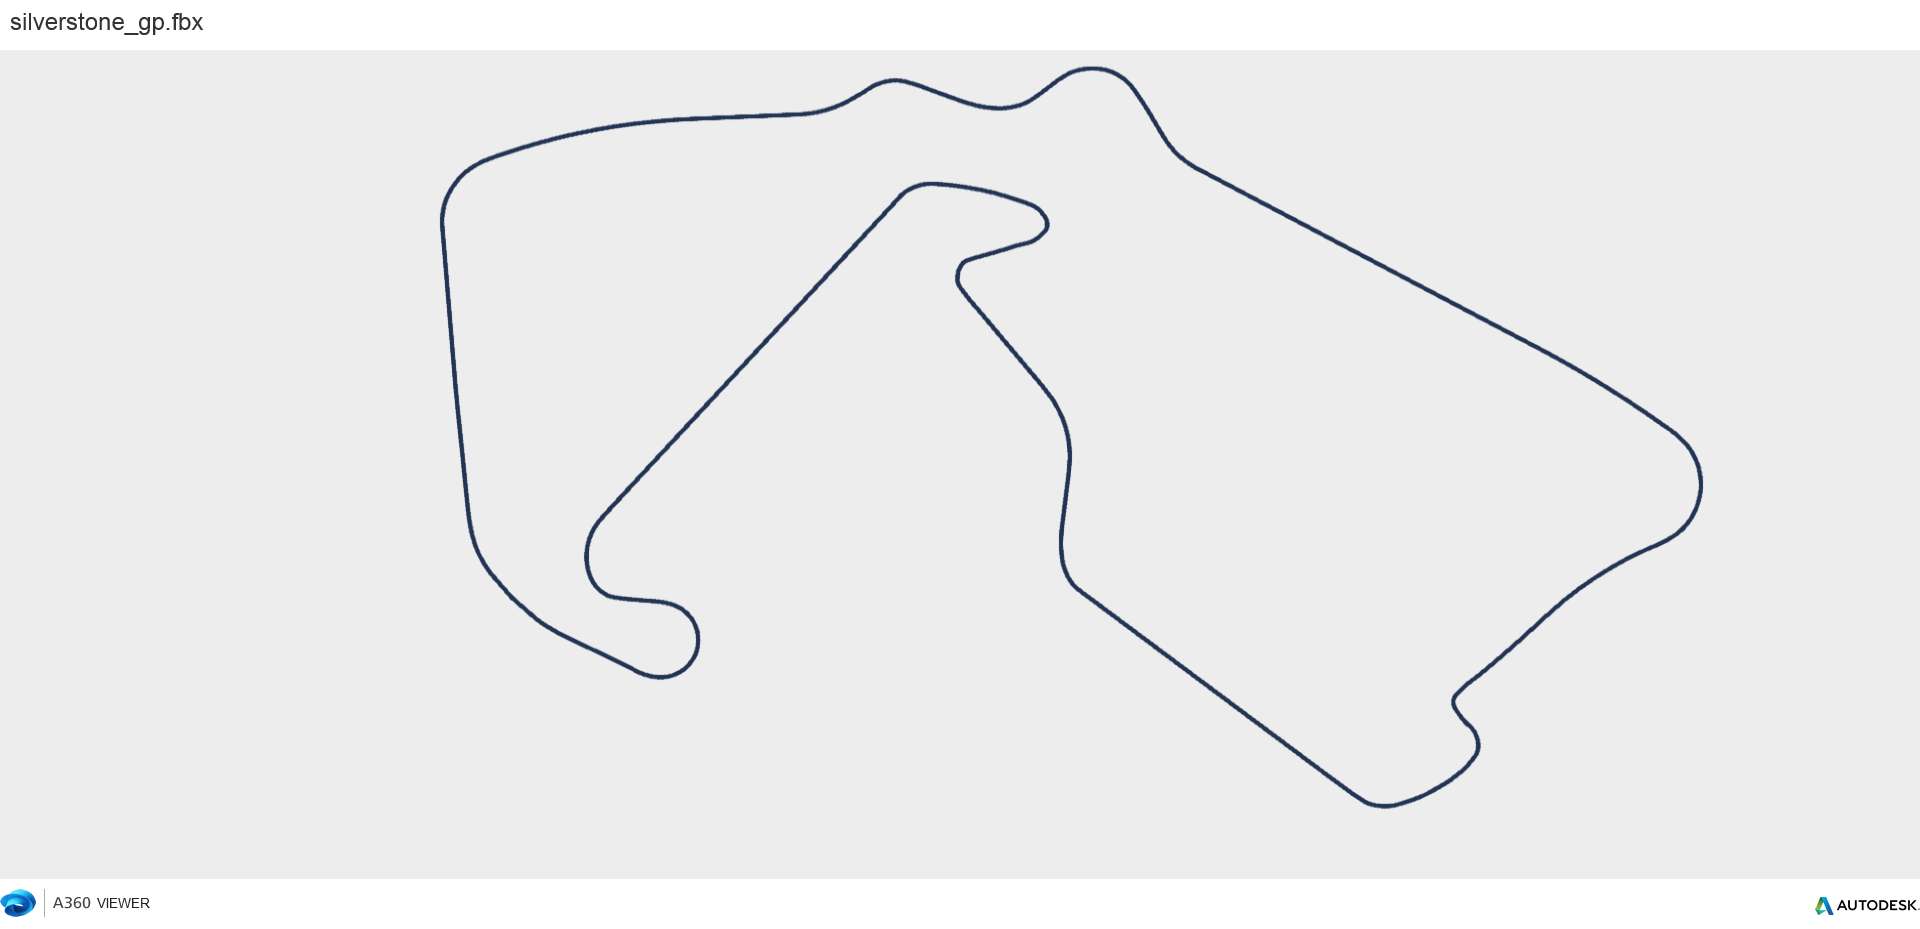 Silverstone | Real Racing 3 Wiki | FANDOM powered by Wikia